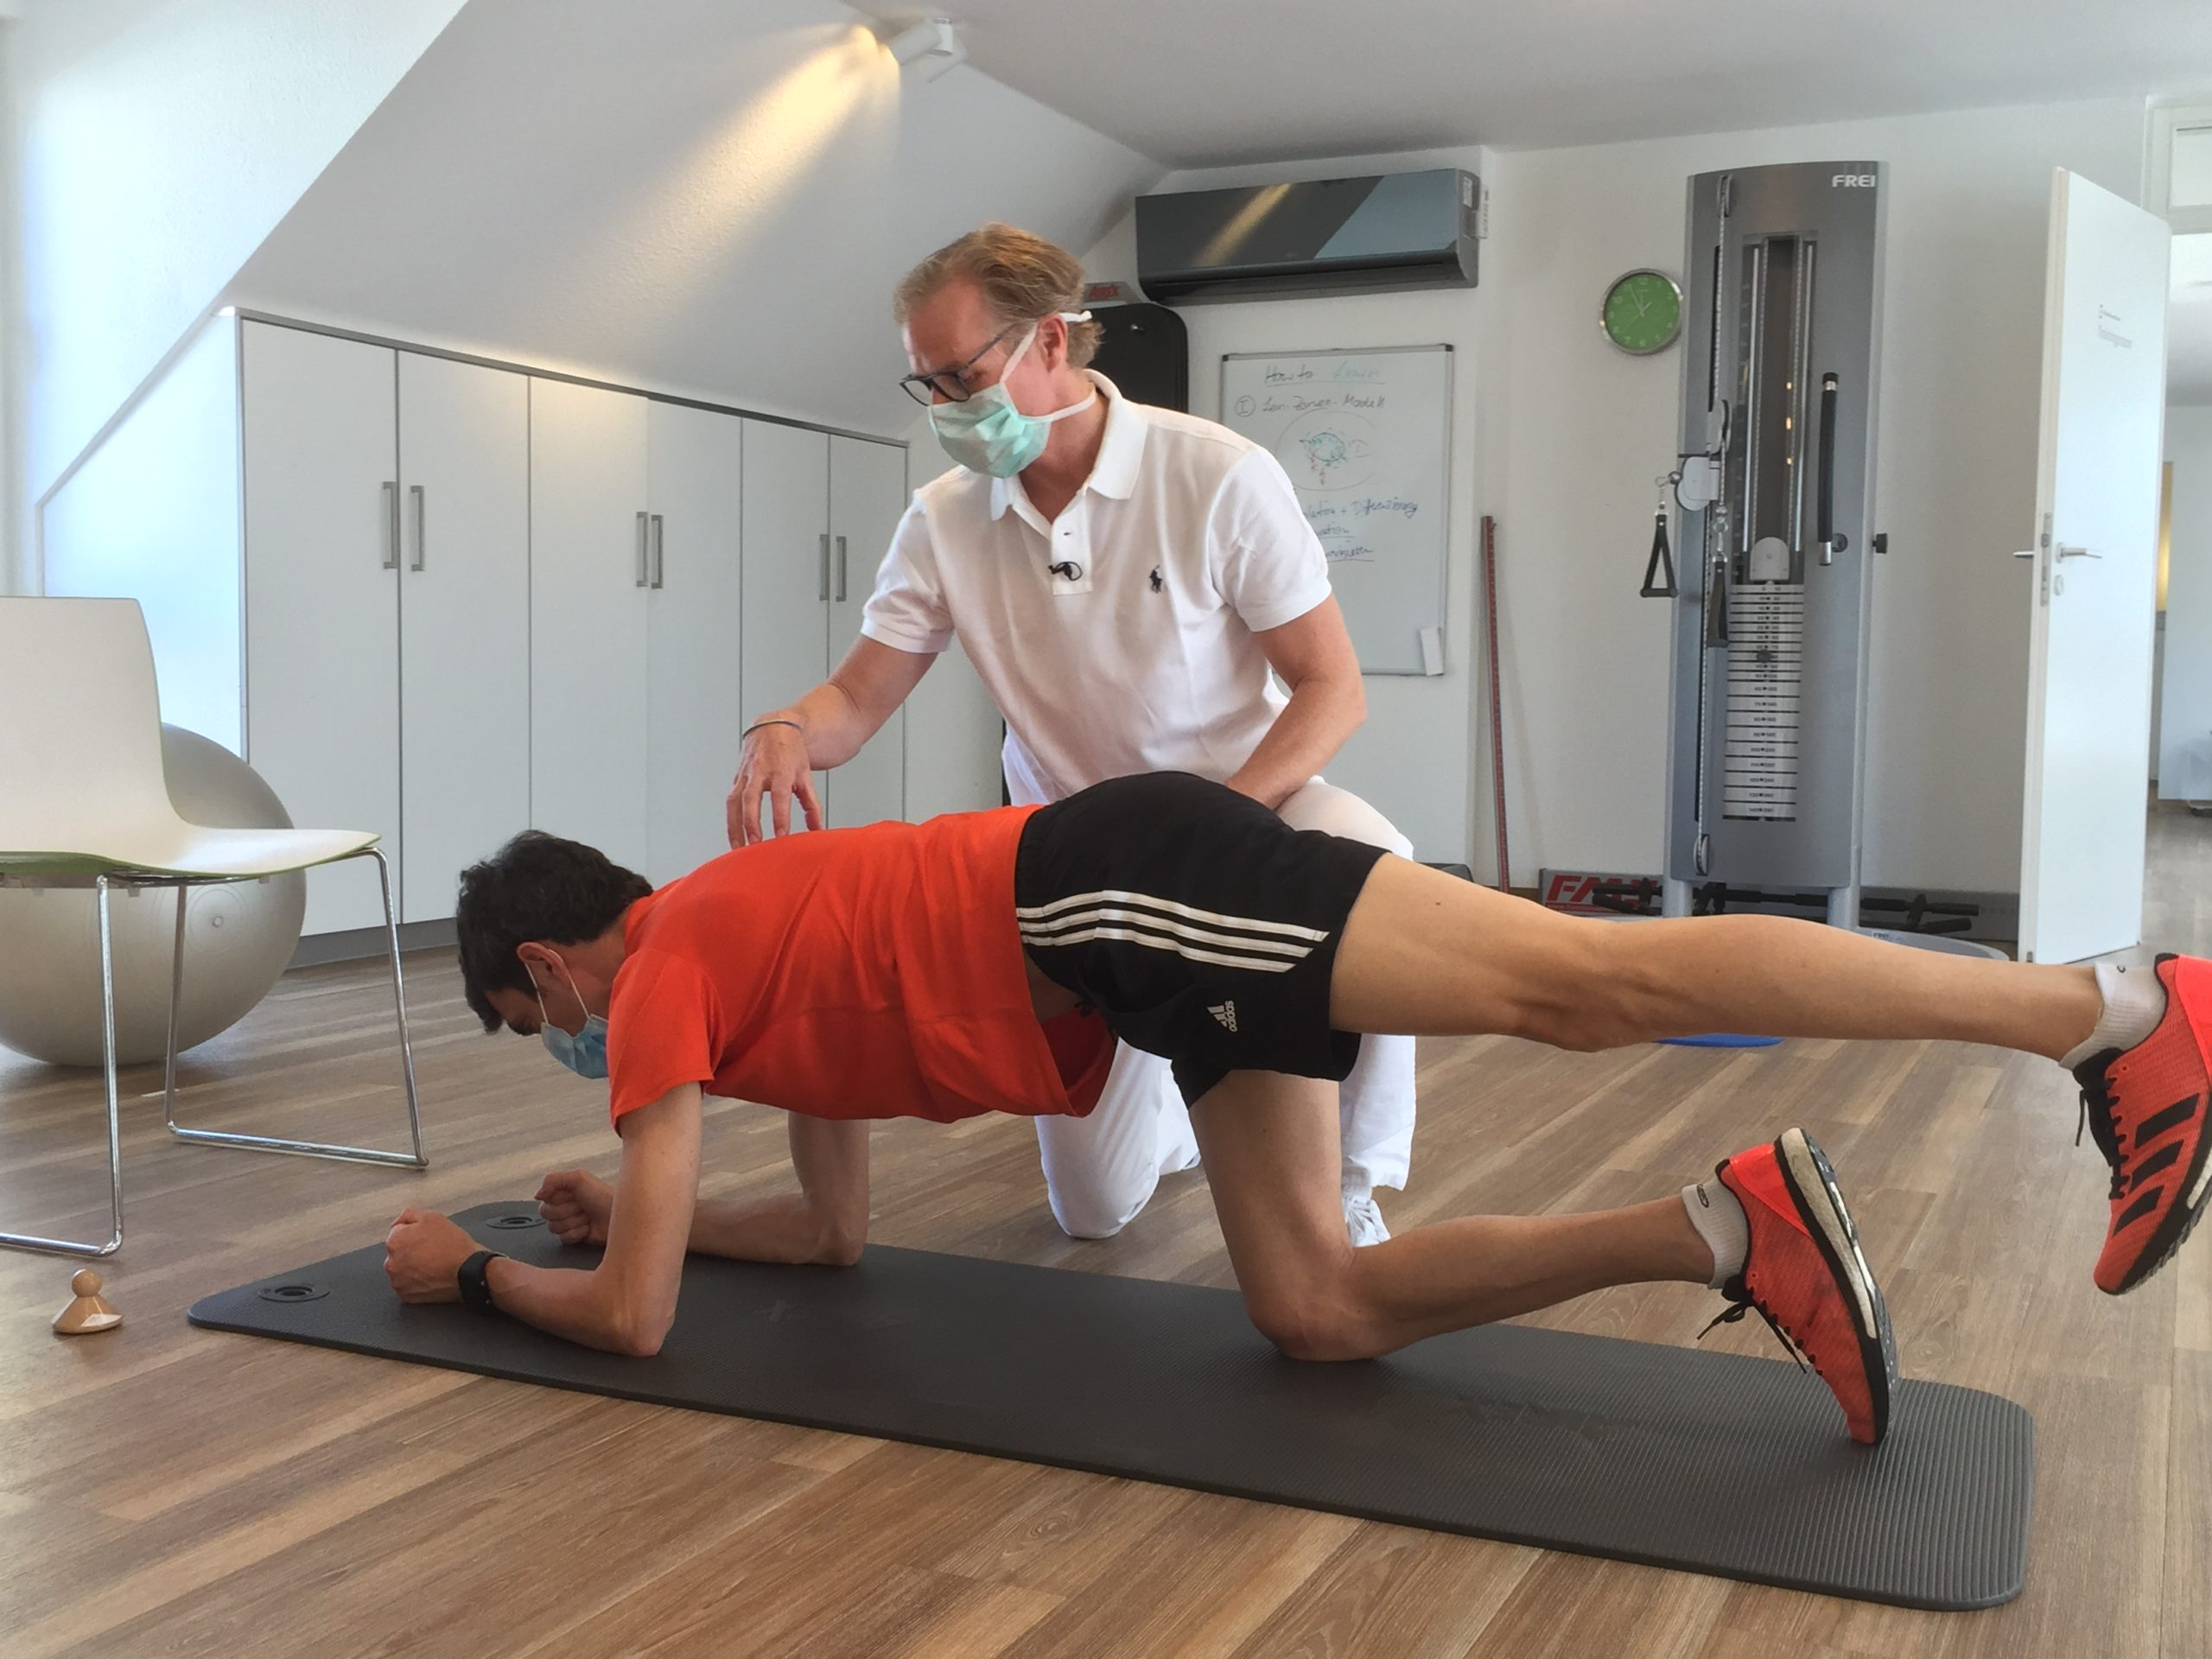 Präventionskurse pausieren - 1:1-Training findet statt